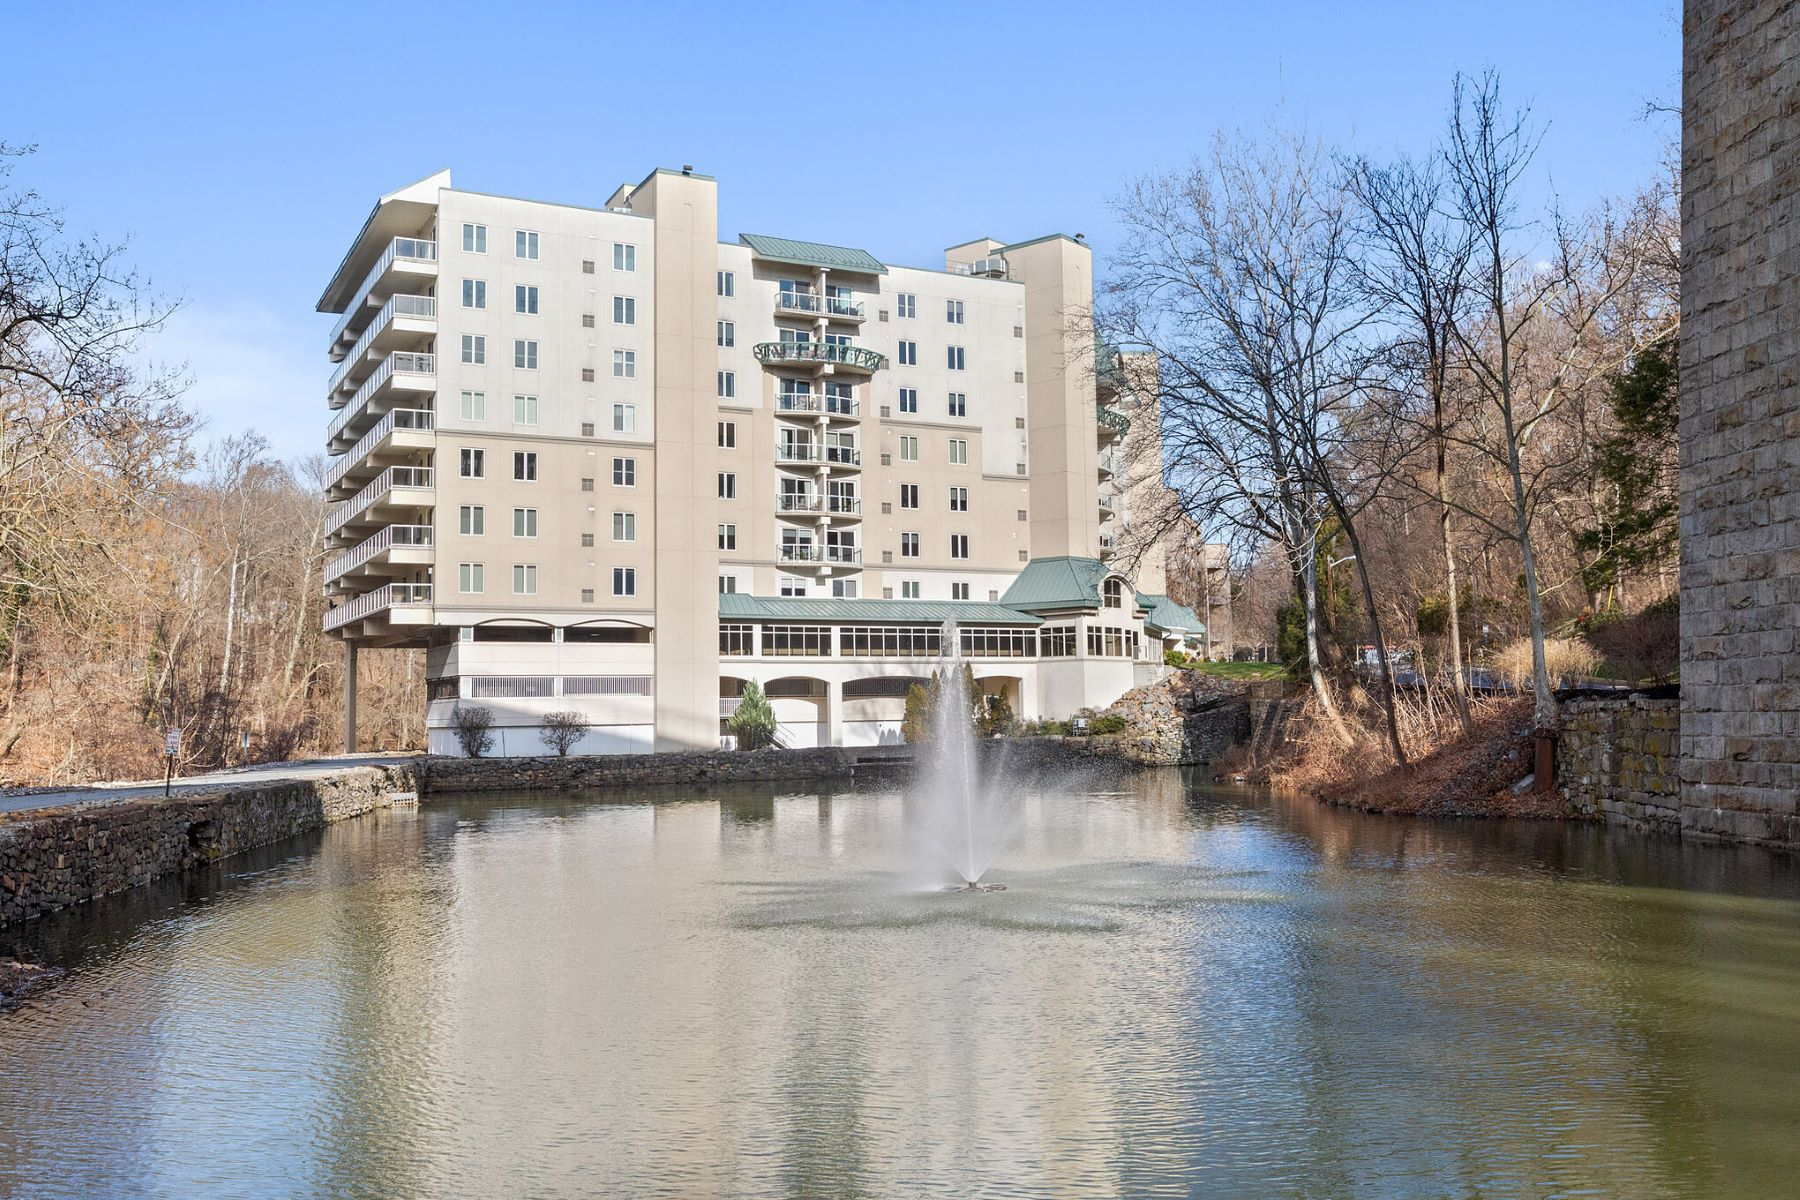 Condominiums for Sale at 1702 N. Park Dr., #18, Wilmington, DE 19806 1702- Unit N Park Drive # 18 Wilmington, Delaware 19806 United States